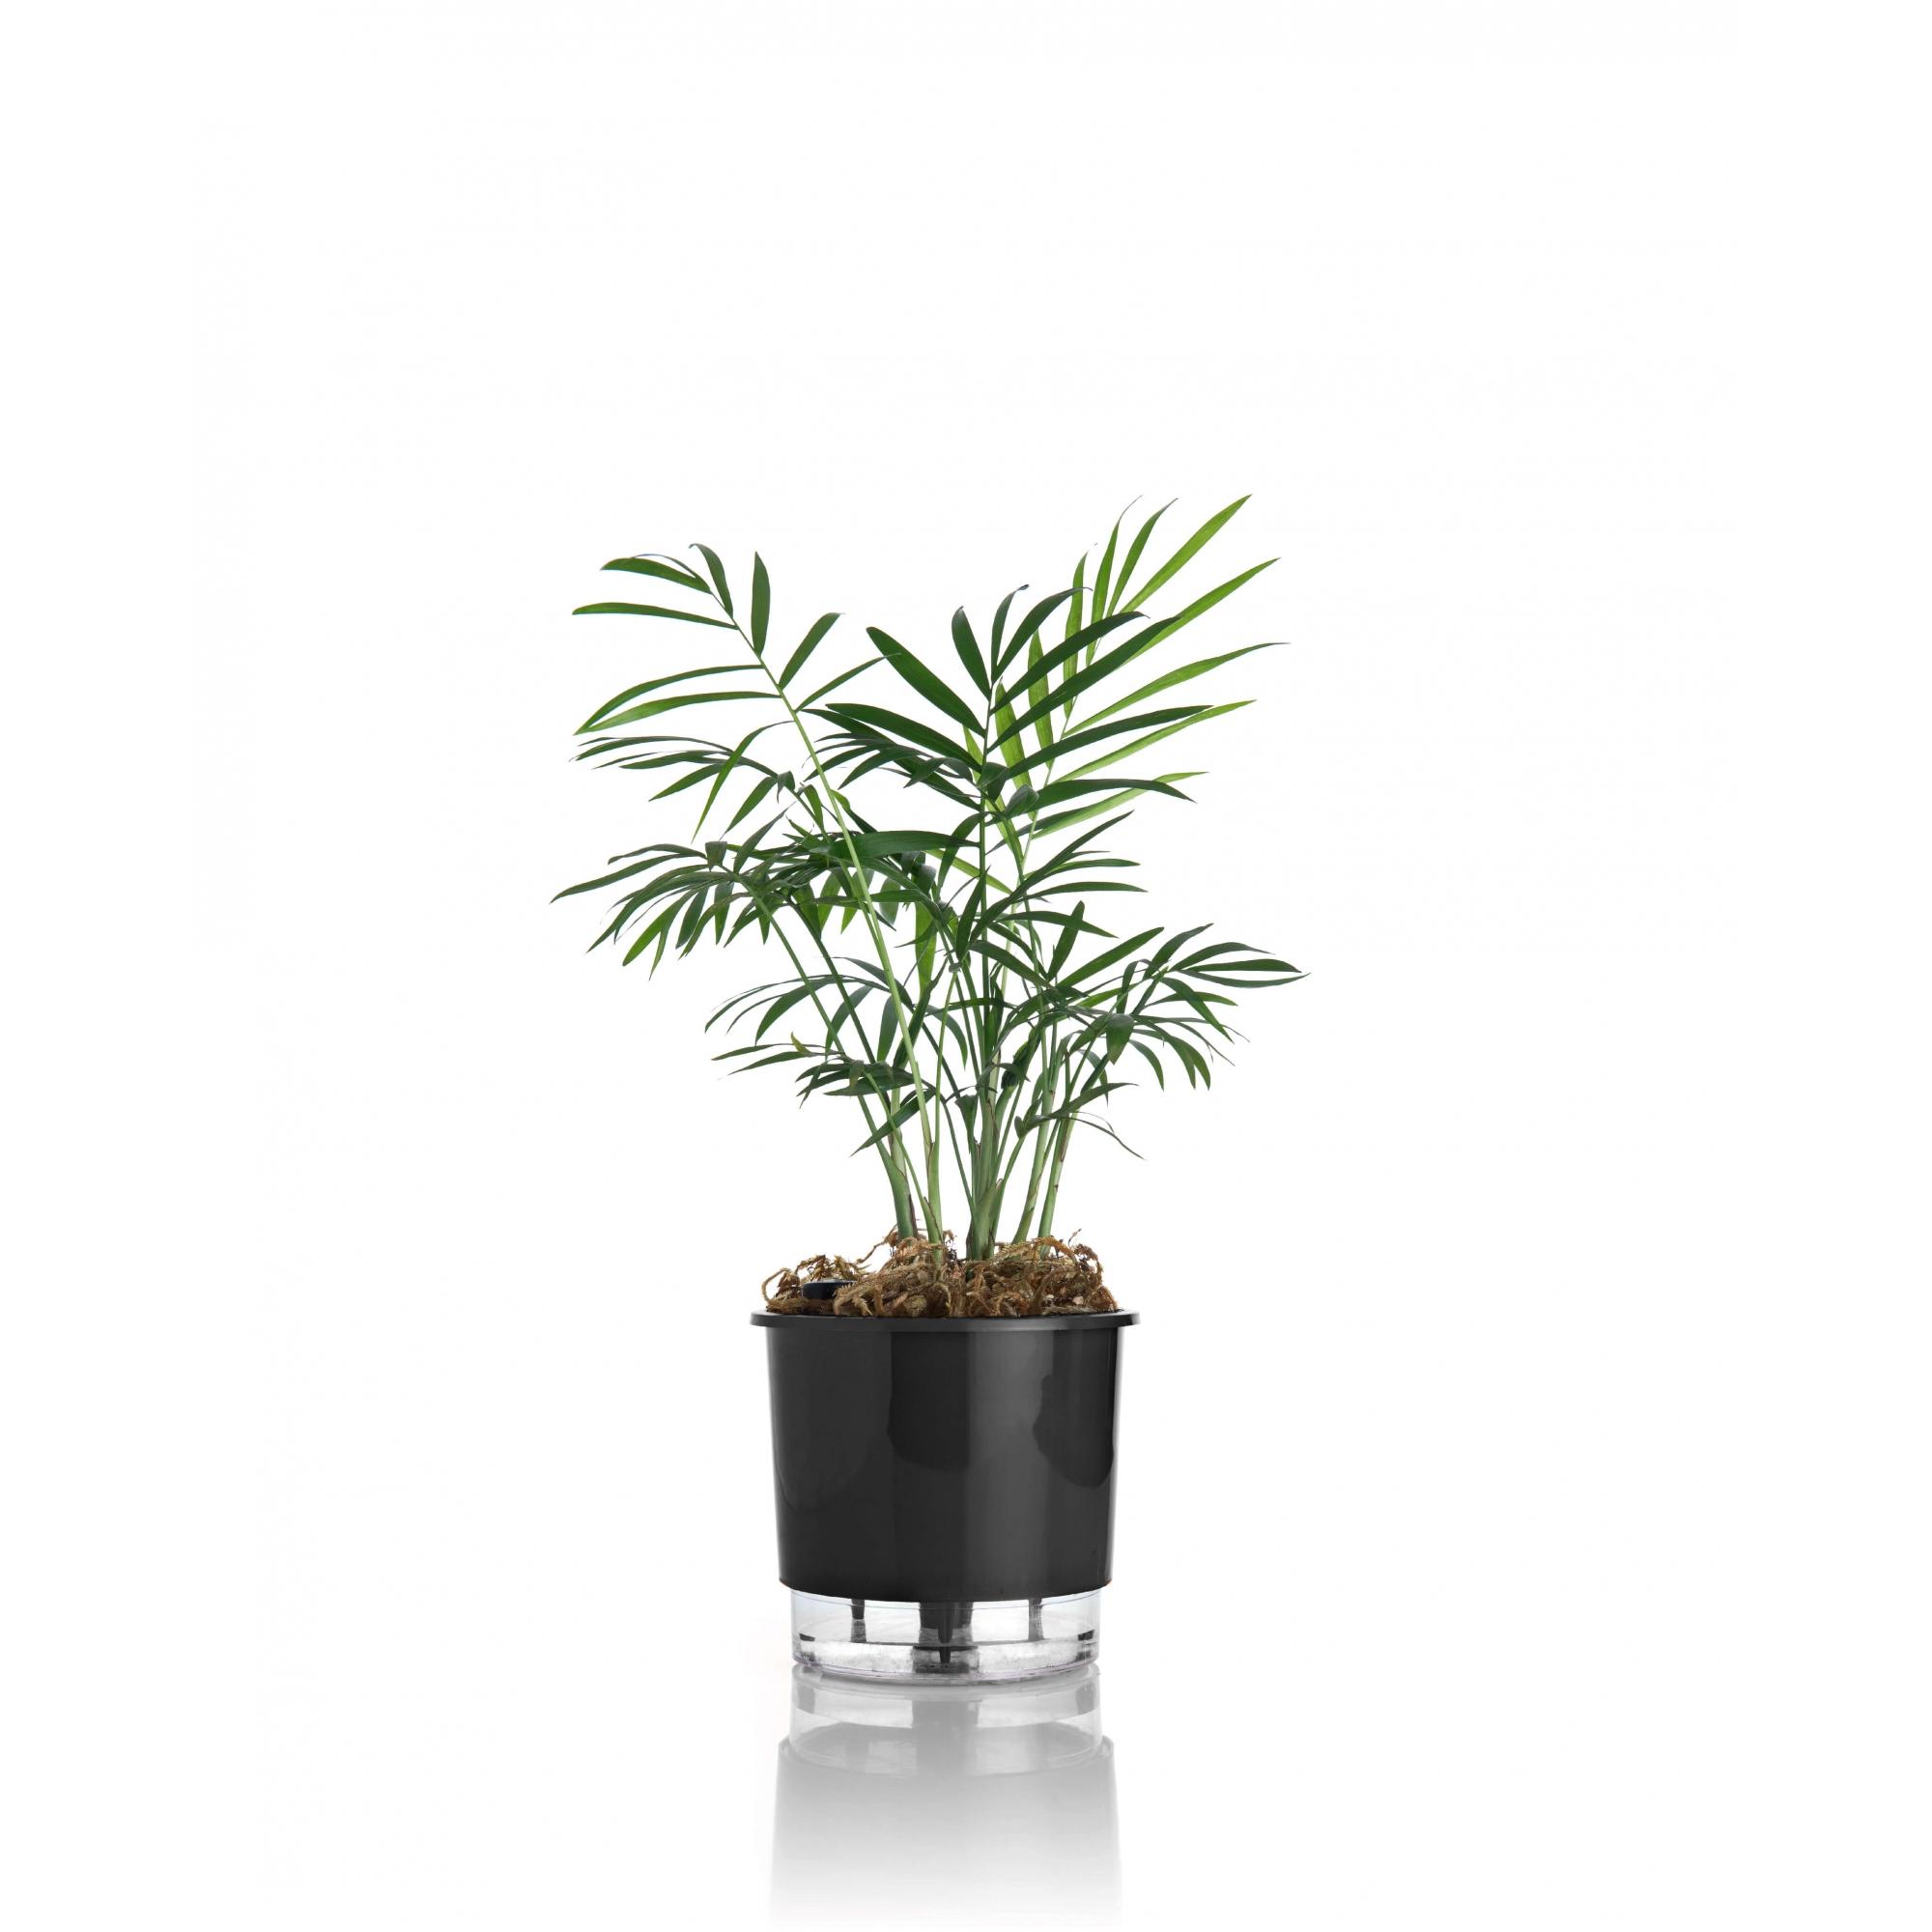 Vaso Autoirrigável Pequeno 12cm x 11cm N02  - Loja Raiz